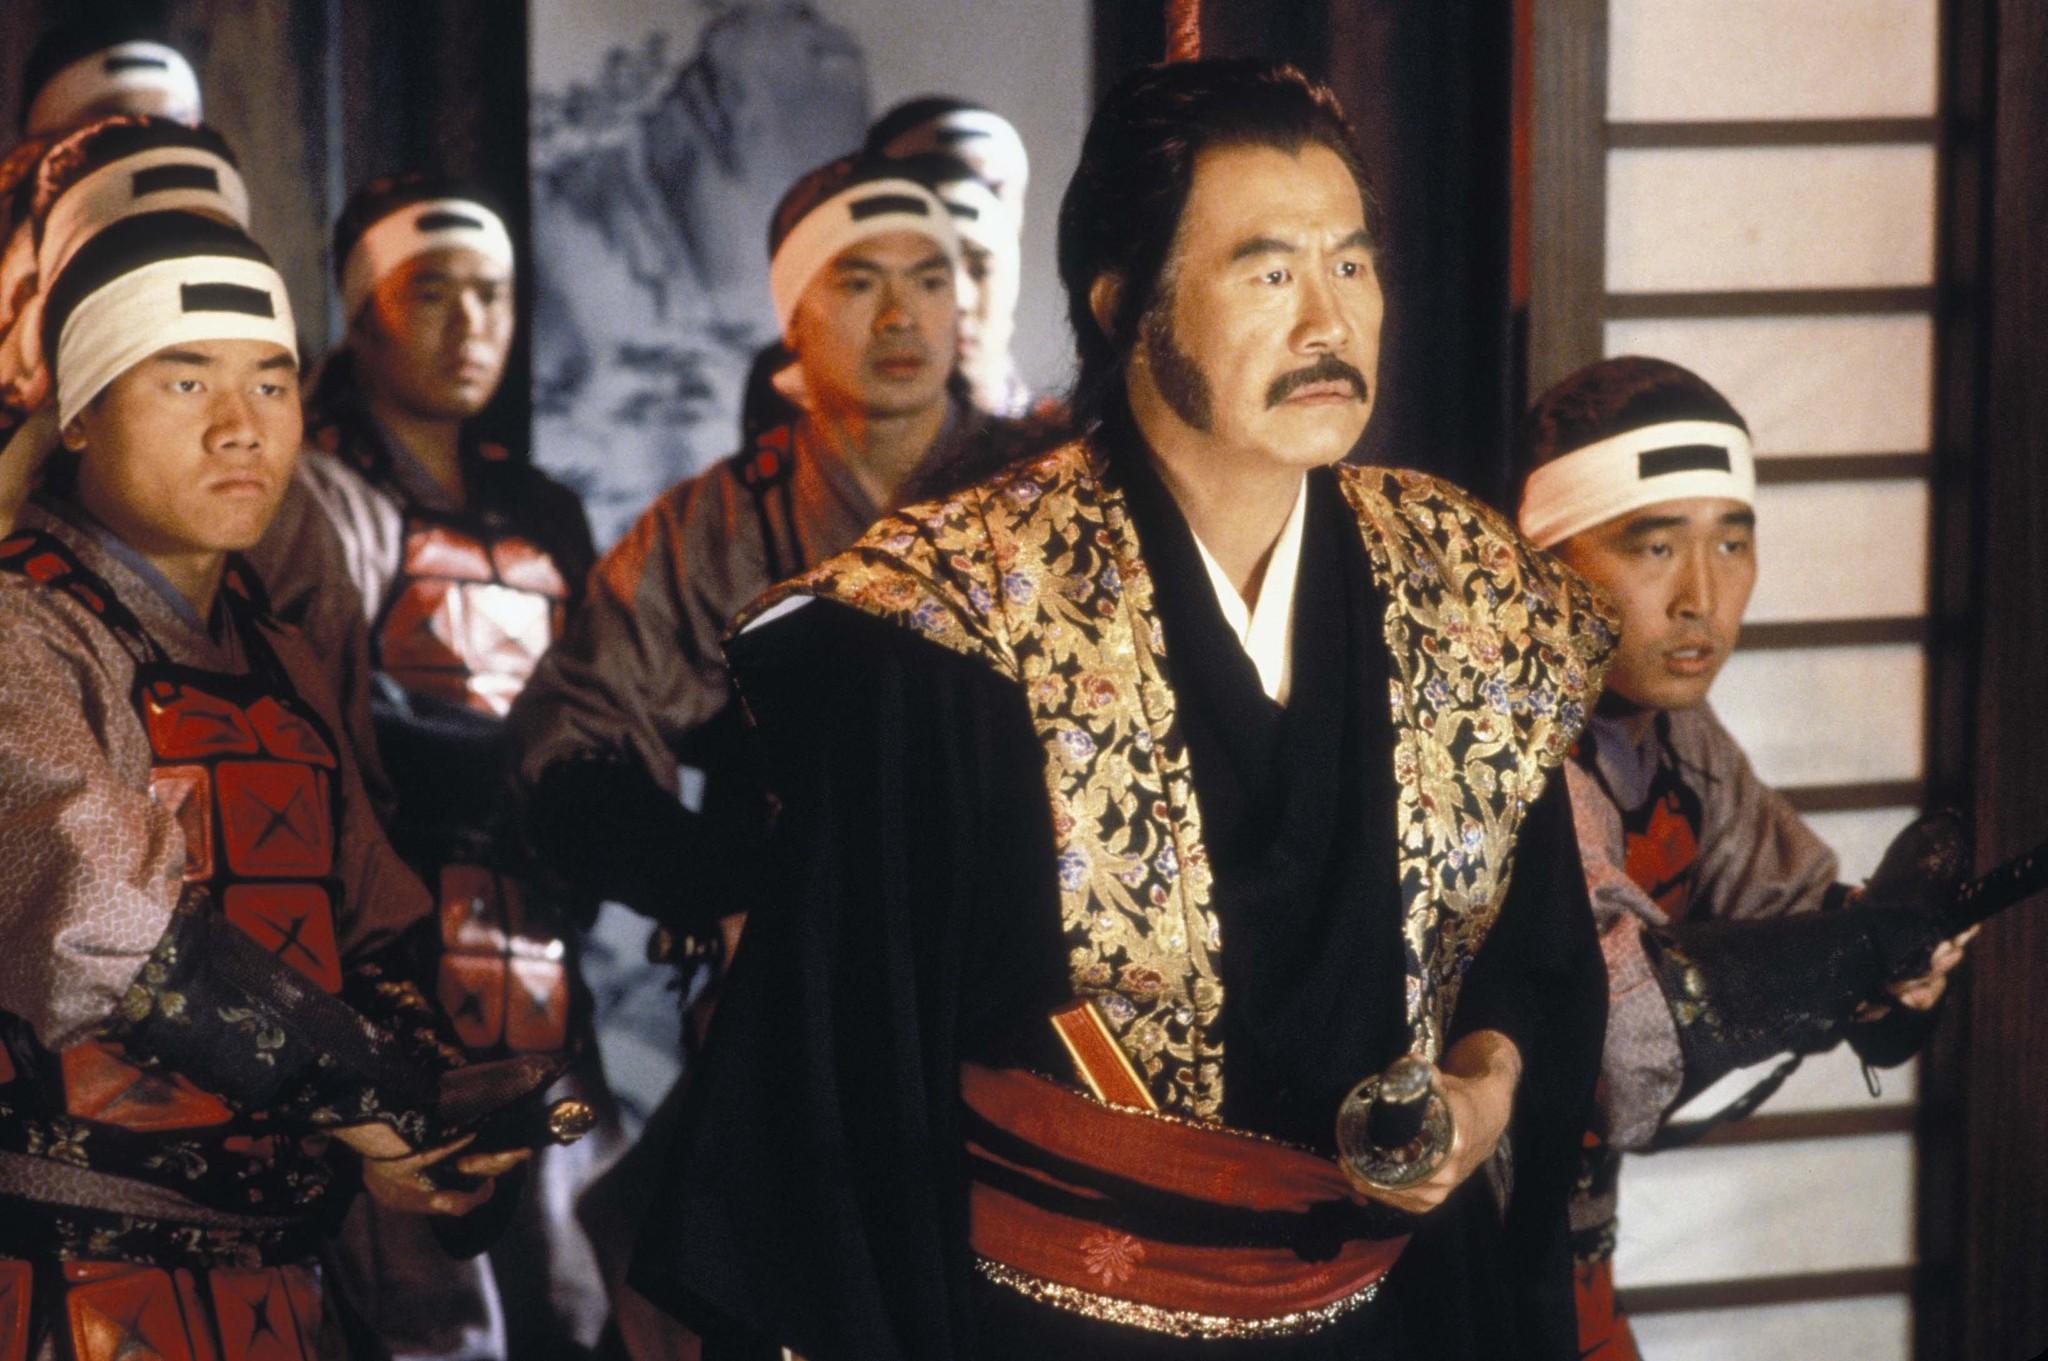 Steve Akahoshi, Ken Kensei, Kent Kim, and Sab Shimono in Teenage Mutant Ninja Turtles III (1993)